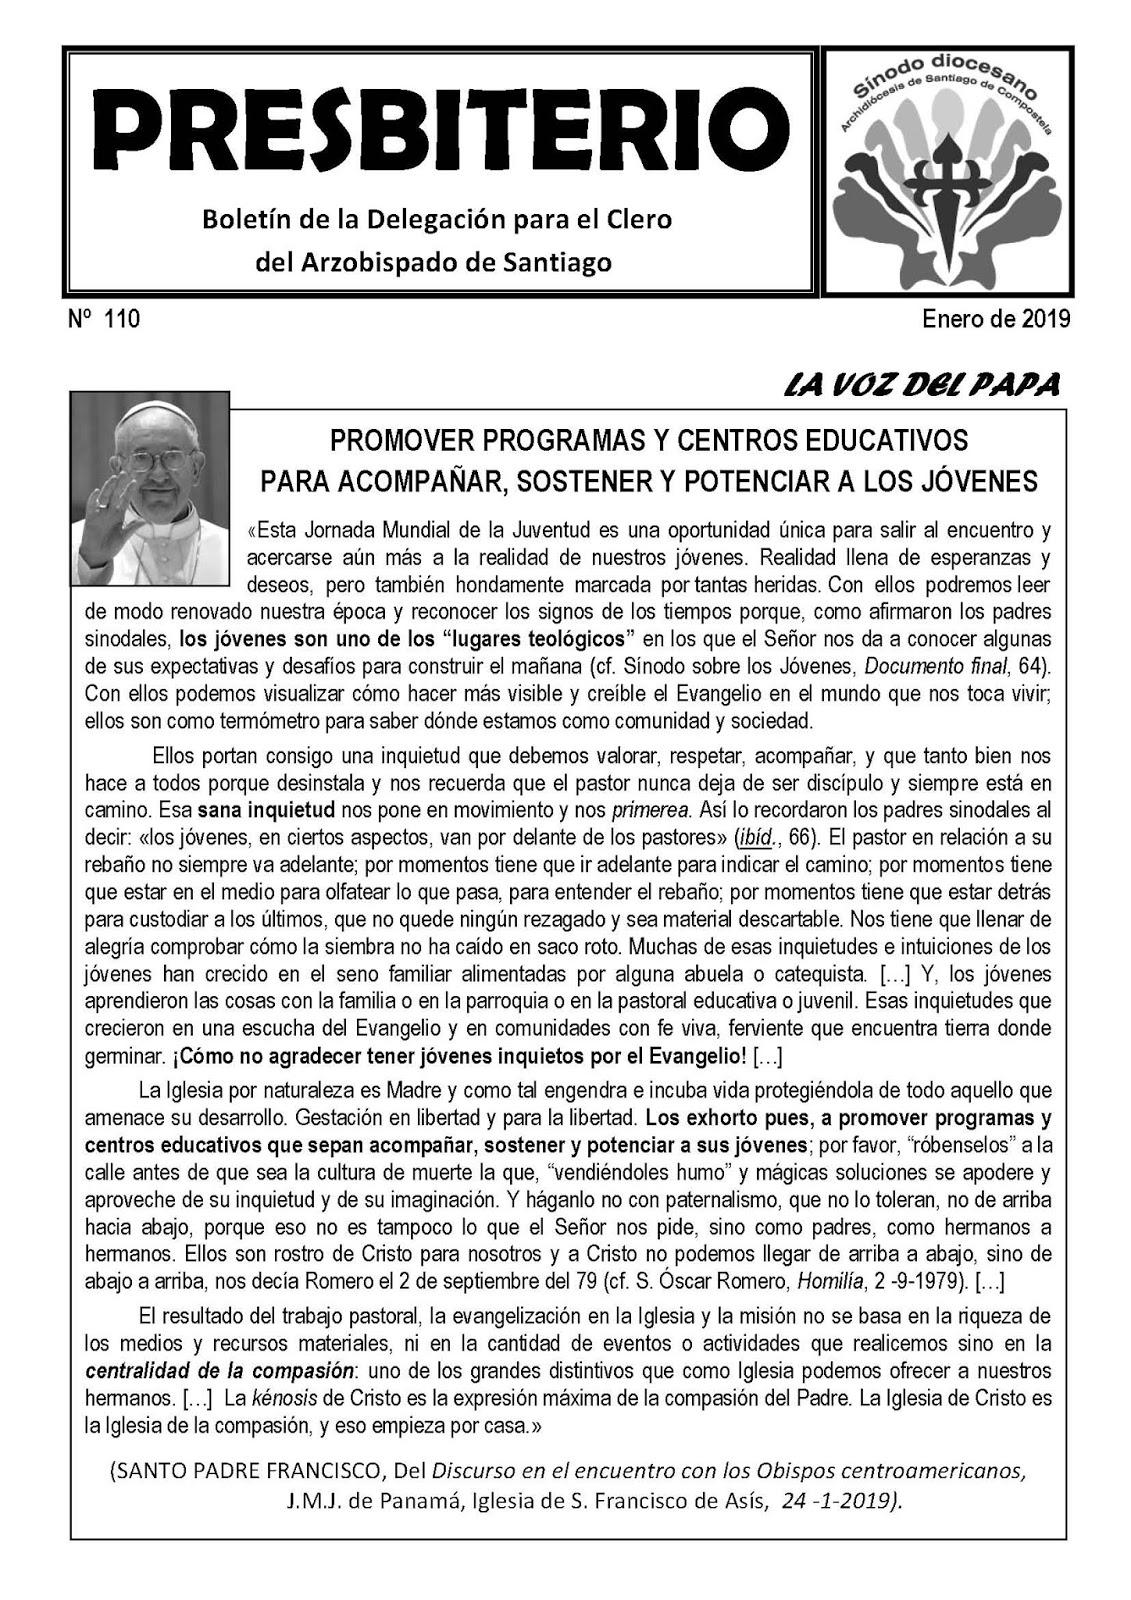 https://www.dropbox.com/s/2oiet2gr6w172f5/Presbiterio_110.pdf?dl=0